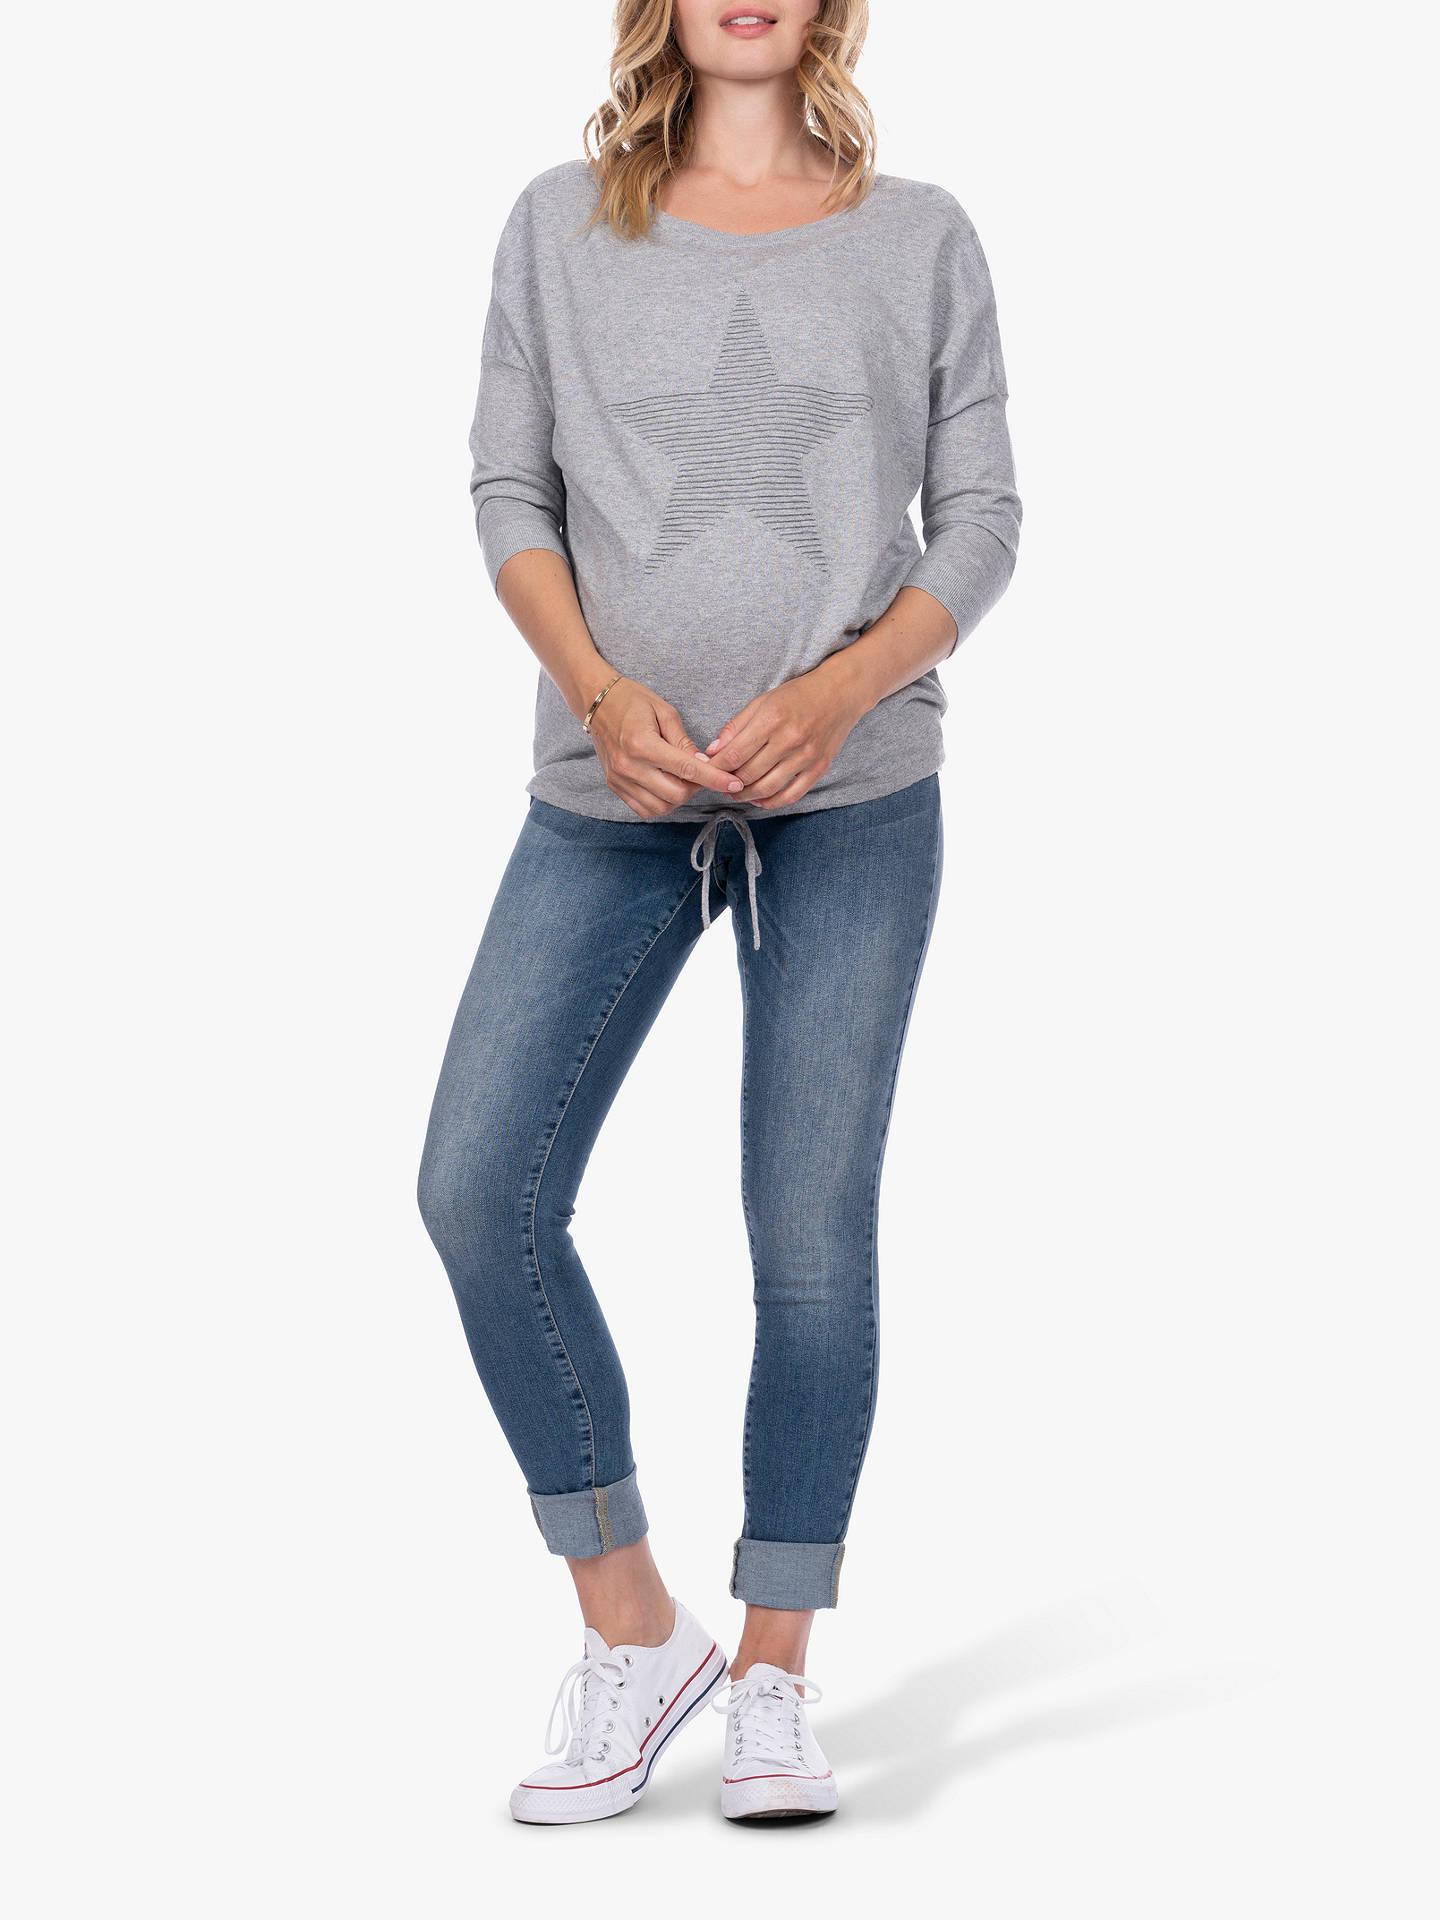 bf2f5bc1537c6 Buy Séraphine Rihanna Star Drawstring Maternity & Nursing Jumper, Grey, L  Online at johnlewis ...